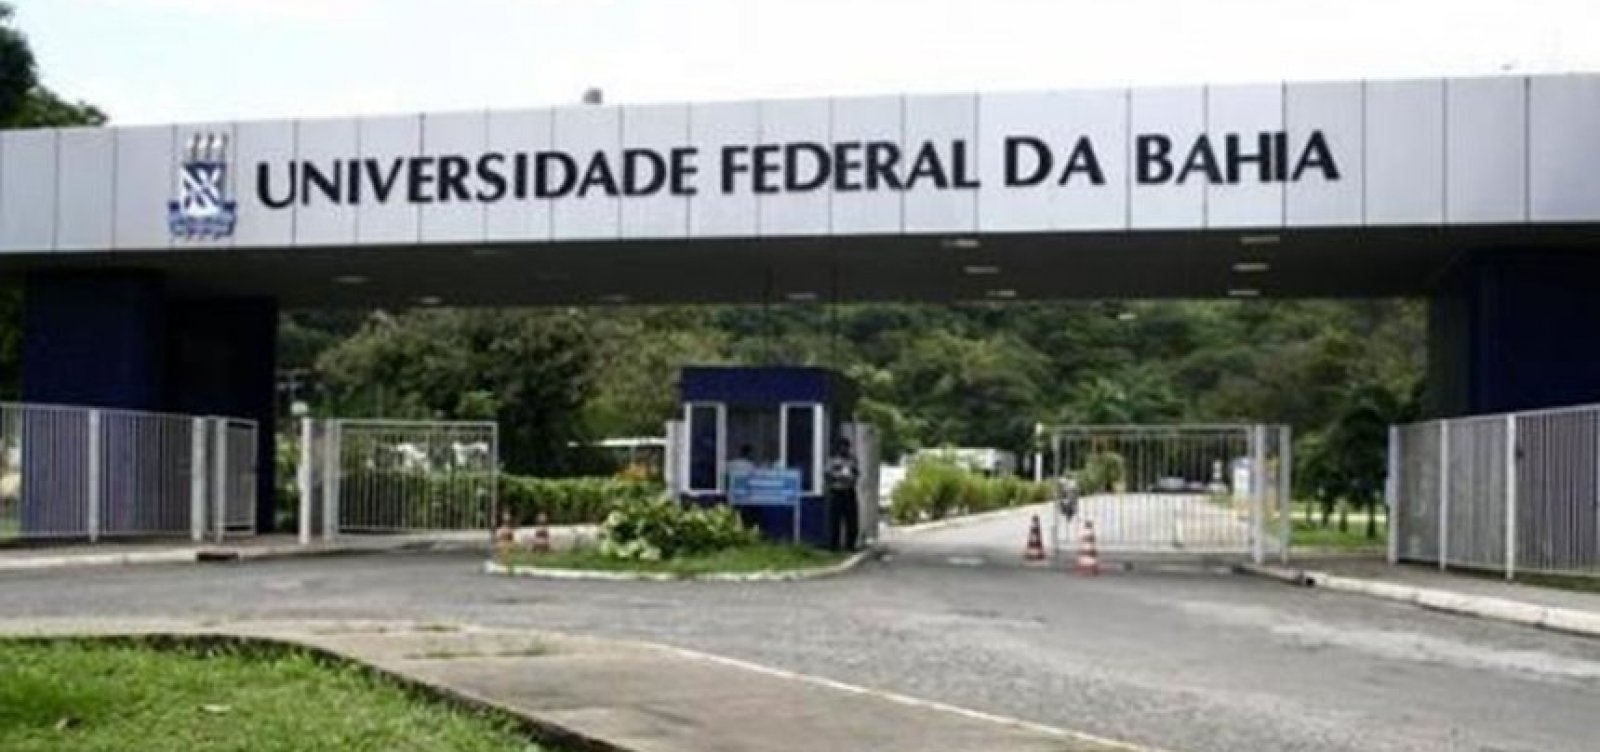 [Universidades baianas perdem 786 cargos após decreto de Bolsonaro]